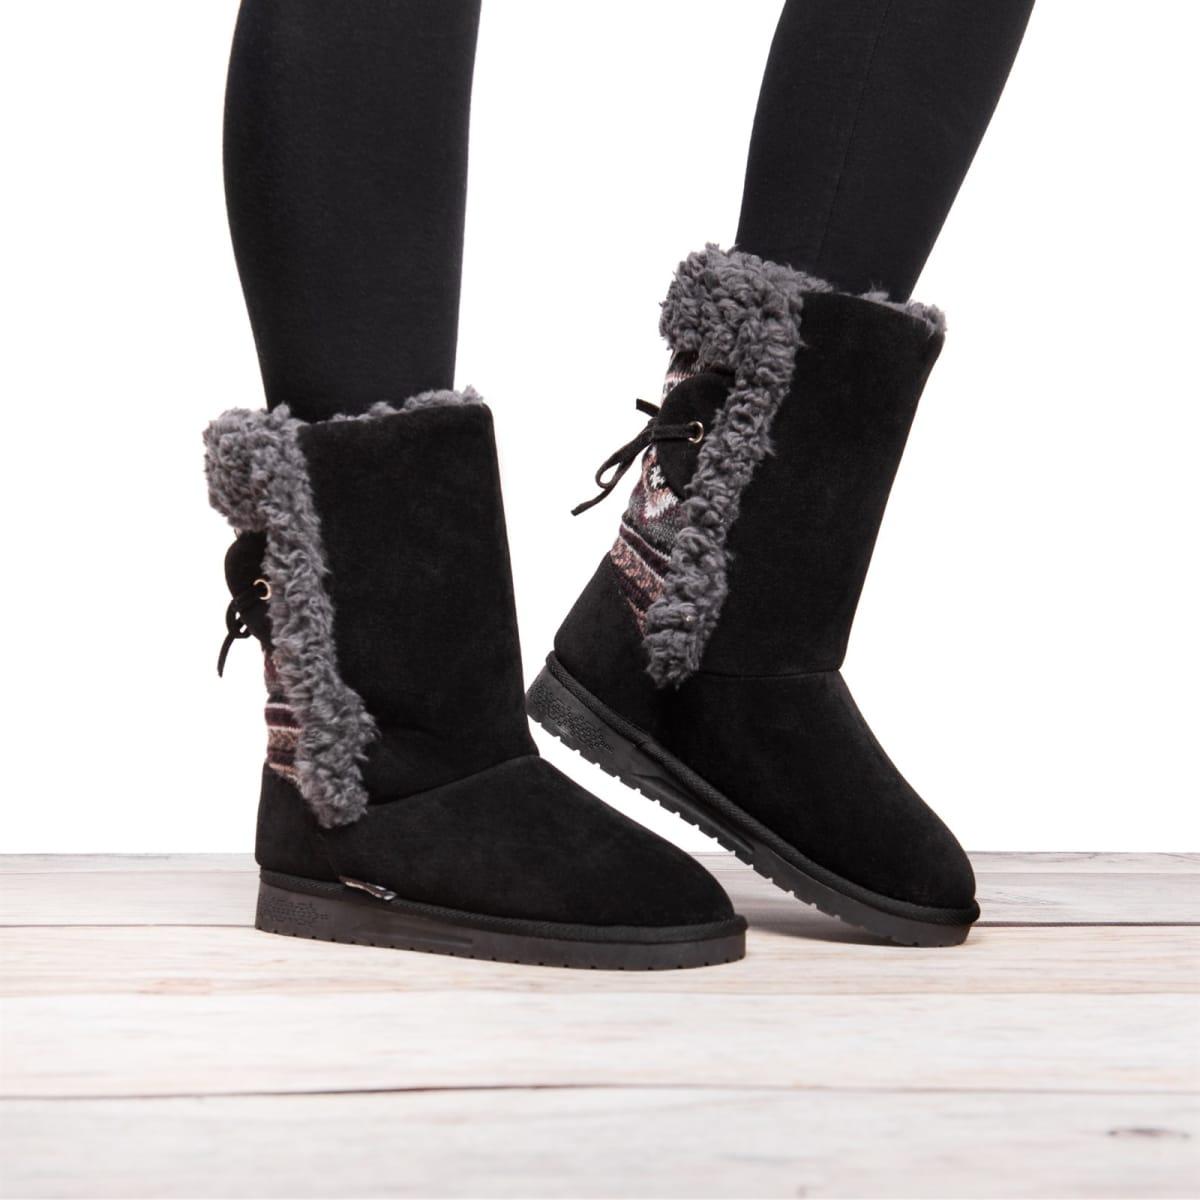 7660db3e5d4 MUK LUKS ®Women's Missy Boots